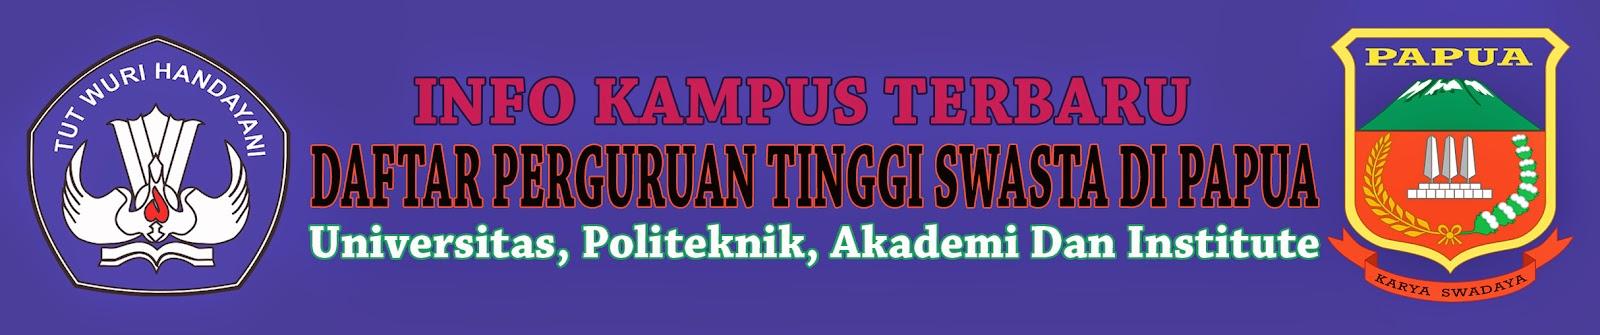 Daftar Perguruan Tinggi Swasta Di Papua